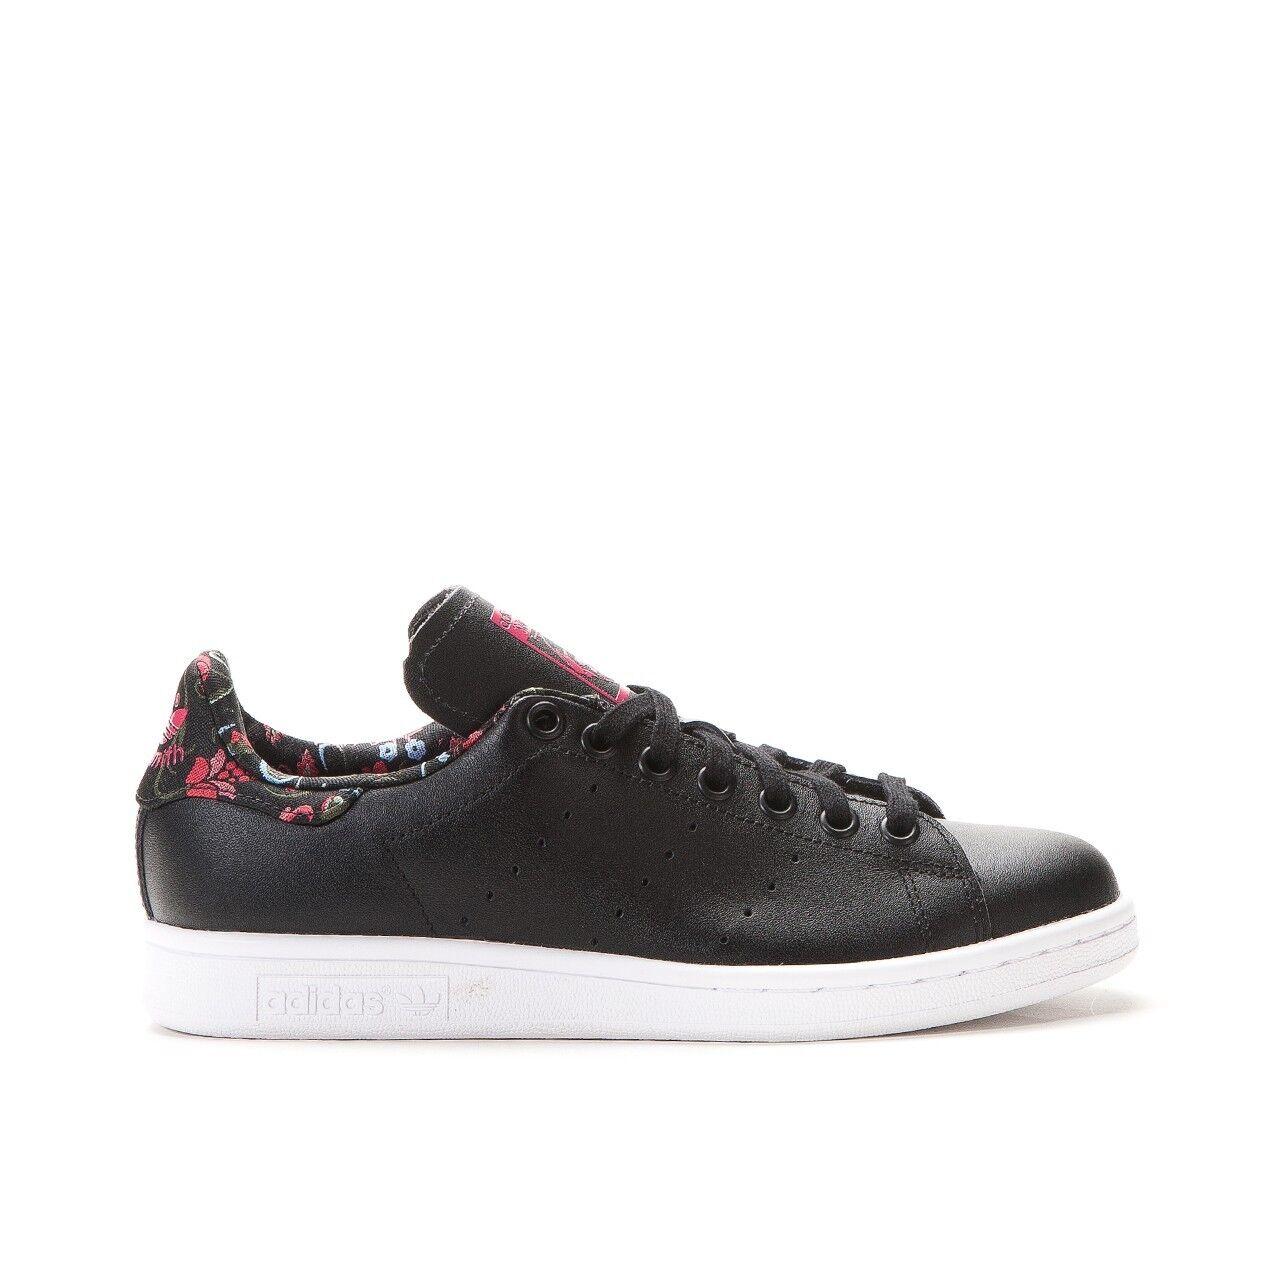 Adidas Originals Stan Smith Russian Bloom  Floral S77348 Black Rare